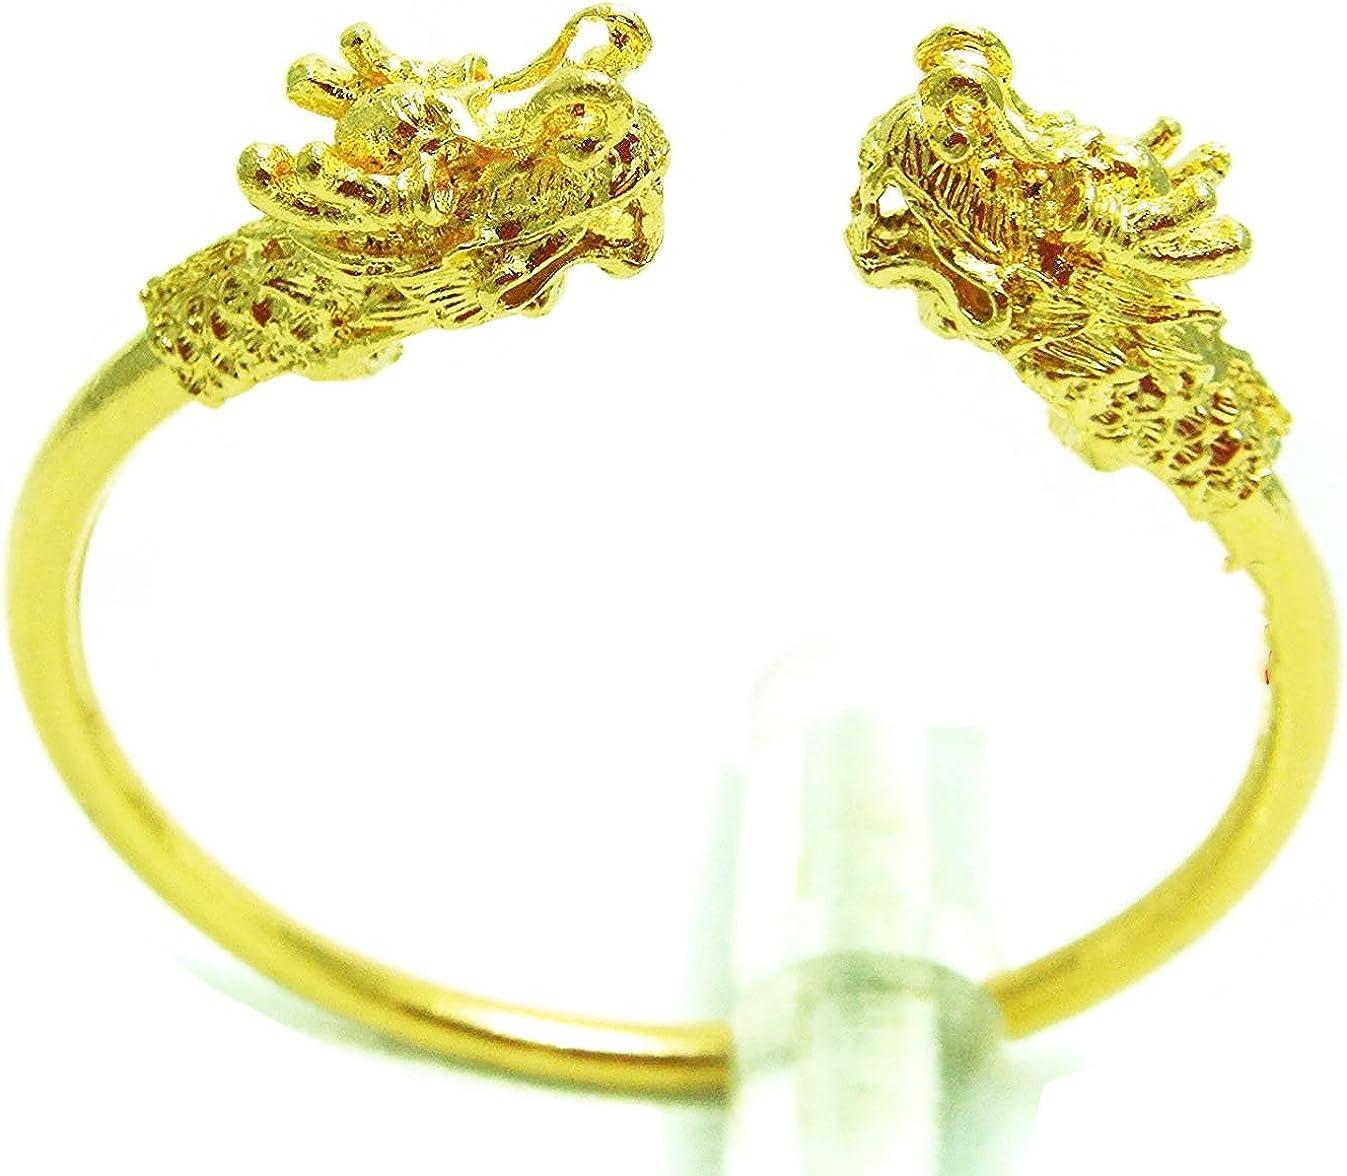 arrawana77 Dragon Bangle 22k 23k 24k Yellow Gold Plated Jewelry Bracelet Weight 49 Gram